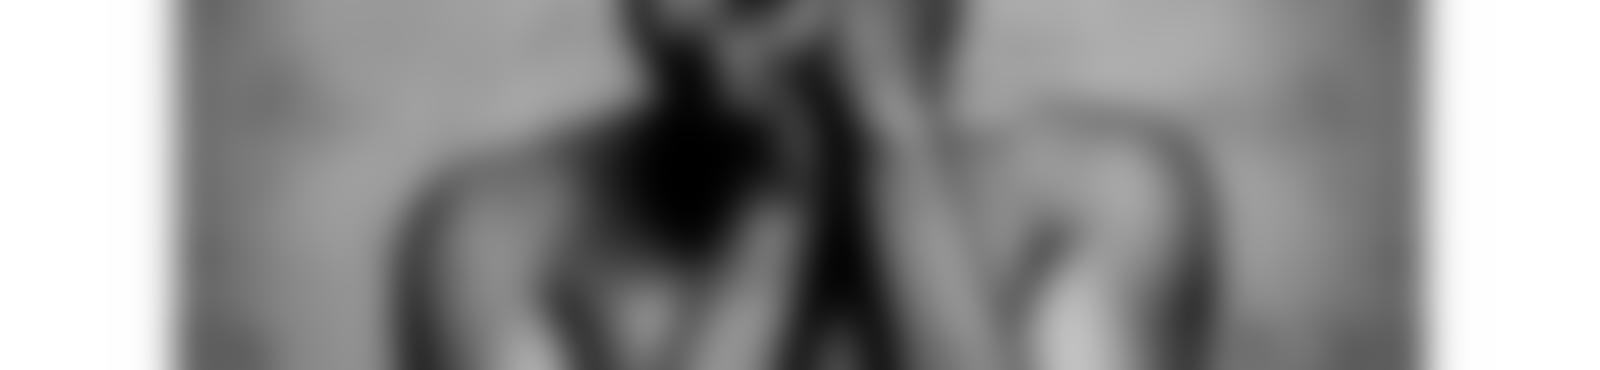 Blurred 82419559 c0ed 49ab a0c9 29a9baa01c27